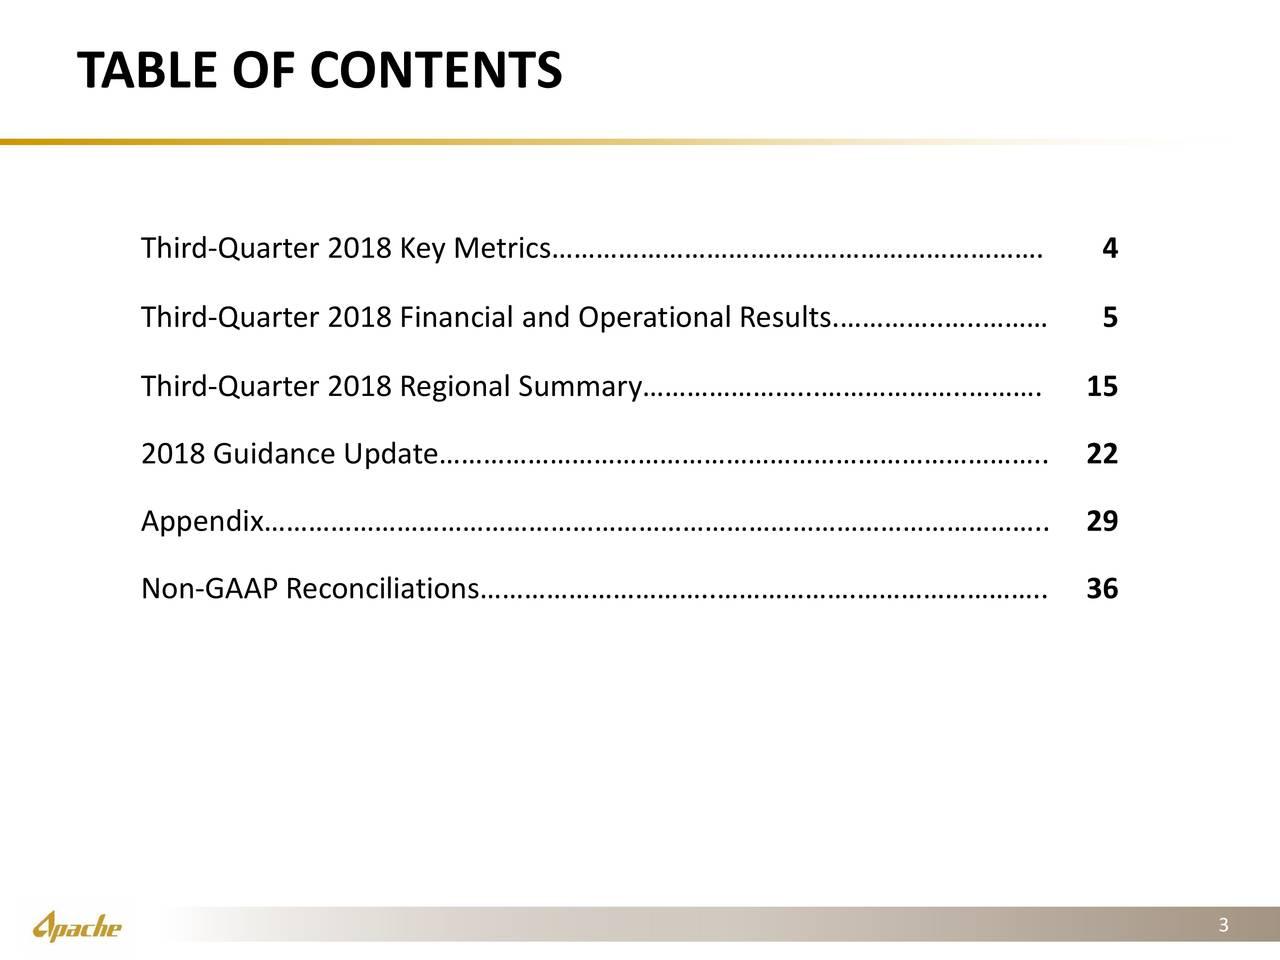 Third-Quarter 2018 Key Metrics…………………………………………………………. 4 Third-Quarter 2018 Financial and Operational Results.…………..5..……… Third-Quarter 2018 Regional Summary…………………...………………..………. 15 2018 Guidance Update……………………………………………………………………….. 22 Appendix…………………………………………………………………………………………….. 29 Non-GAAP Reconciliations…………………………..……………….…………………….. 36 3